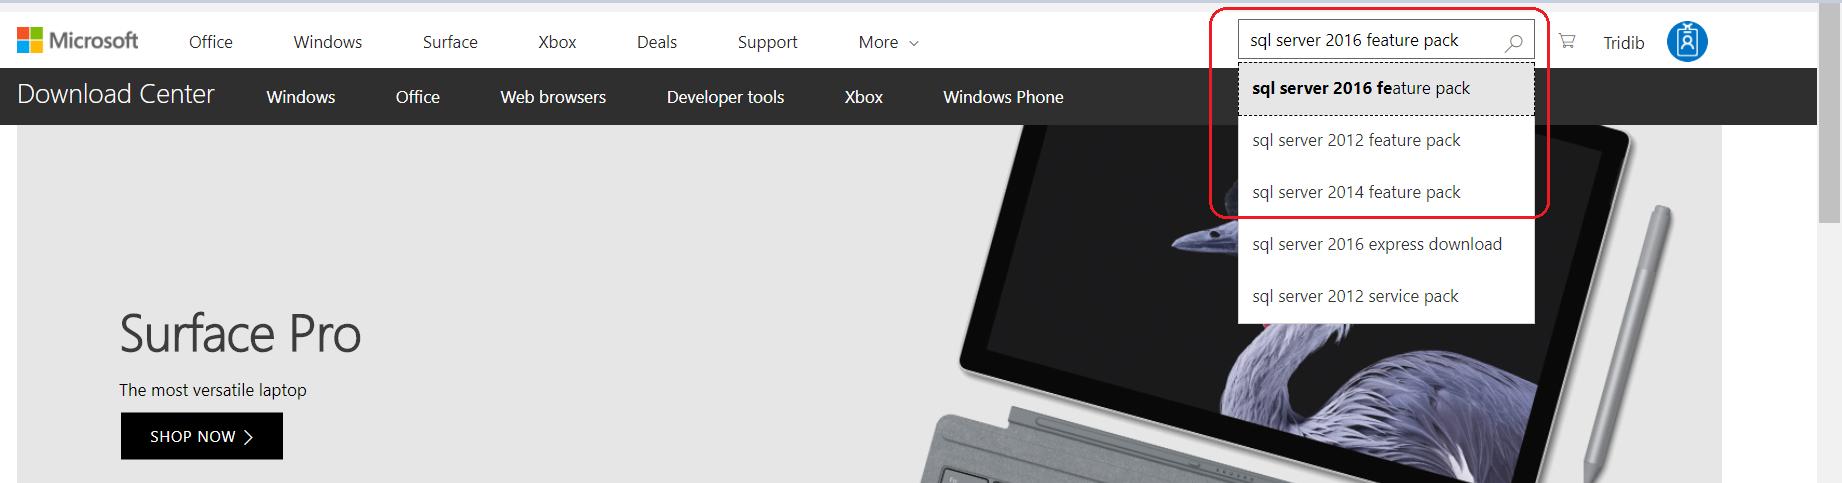 Download OLEDB Provider For DB2 Microsoft Download Center